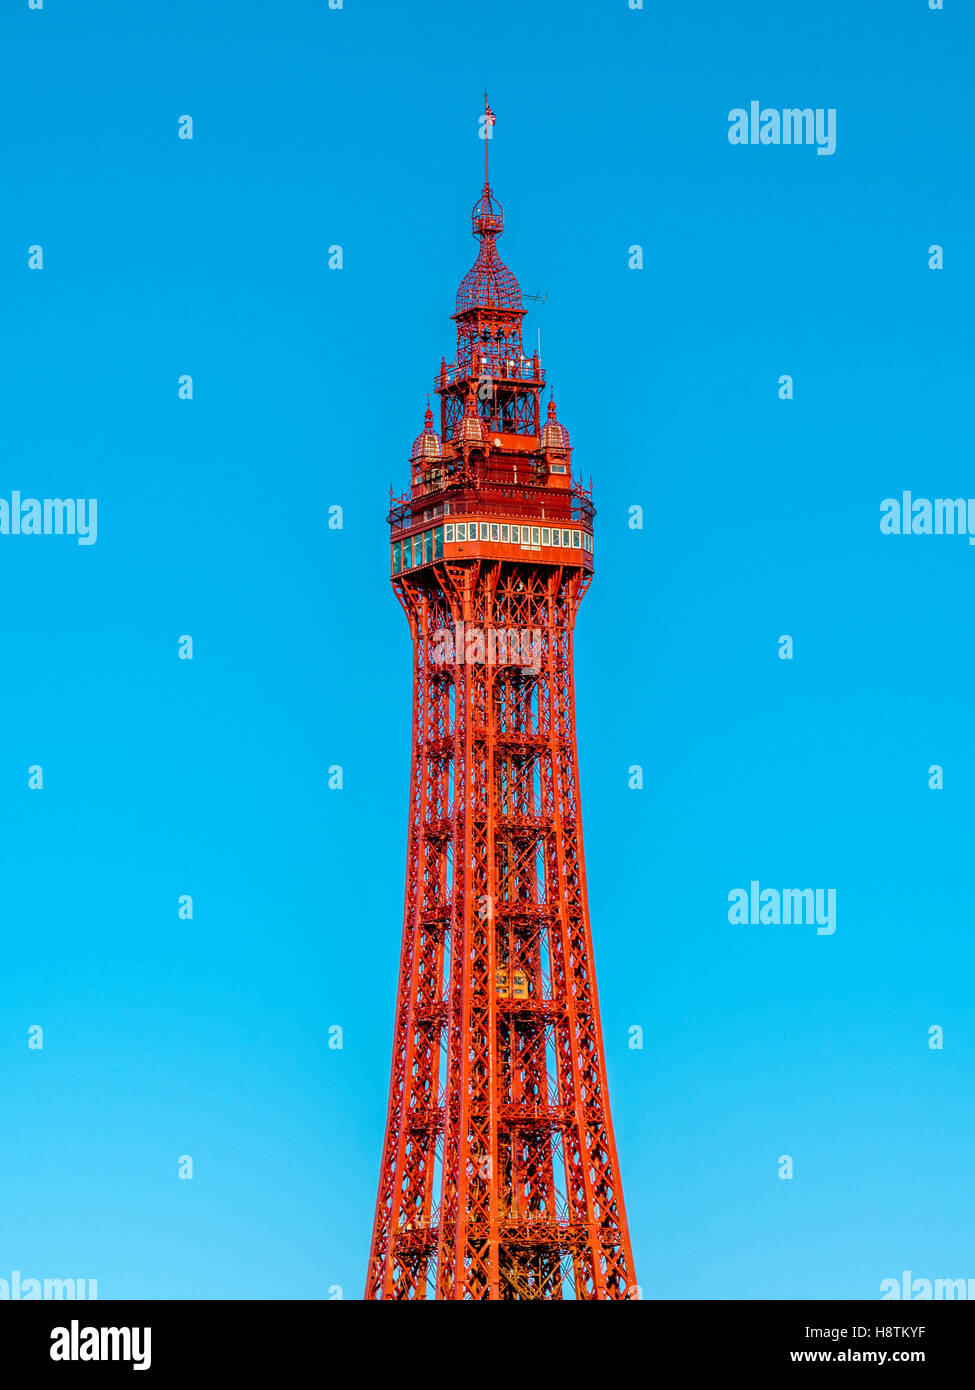 La torre de Blackpool, Lancashire, Reino Unido. Imagen De Stock